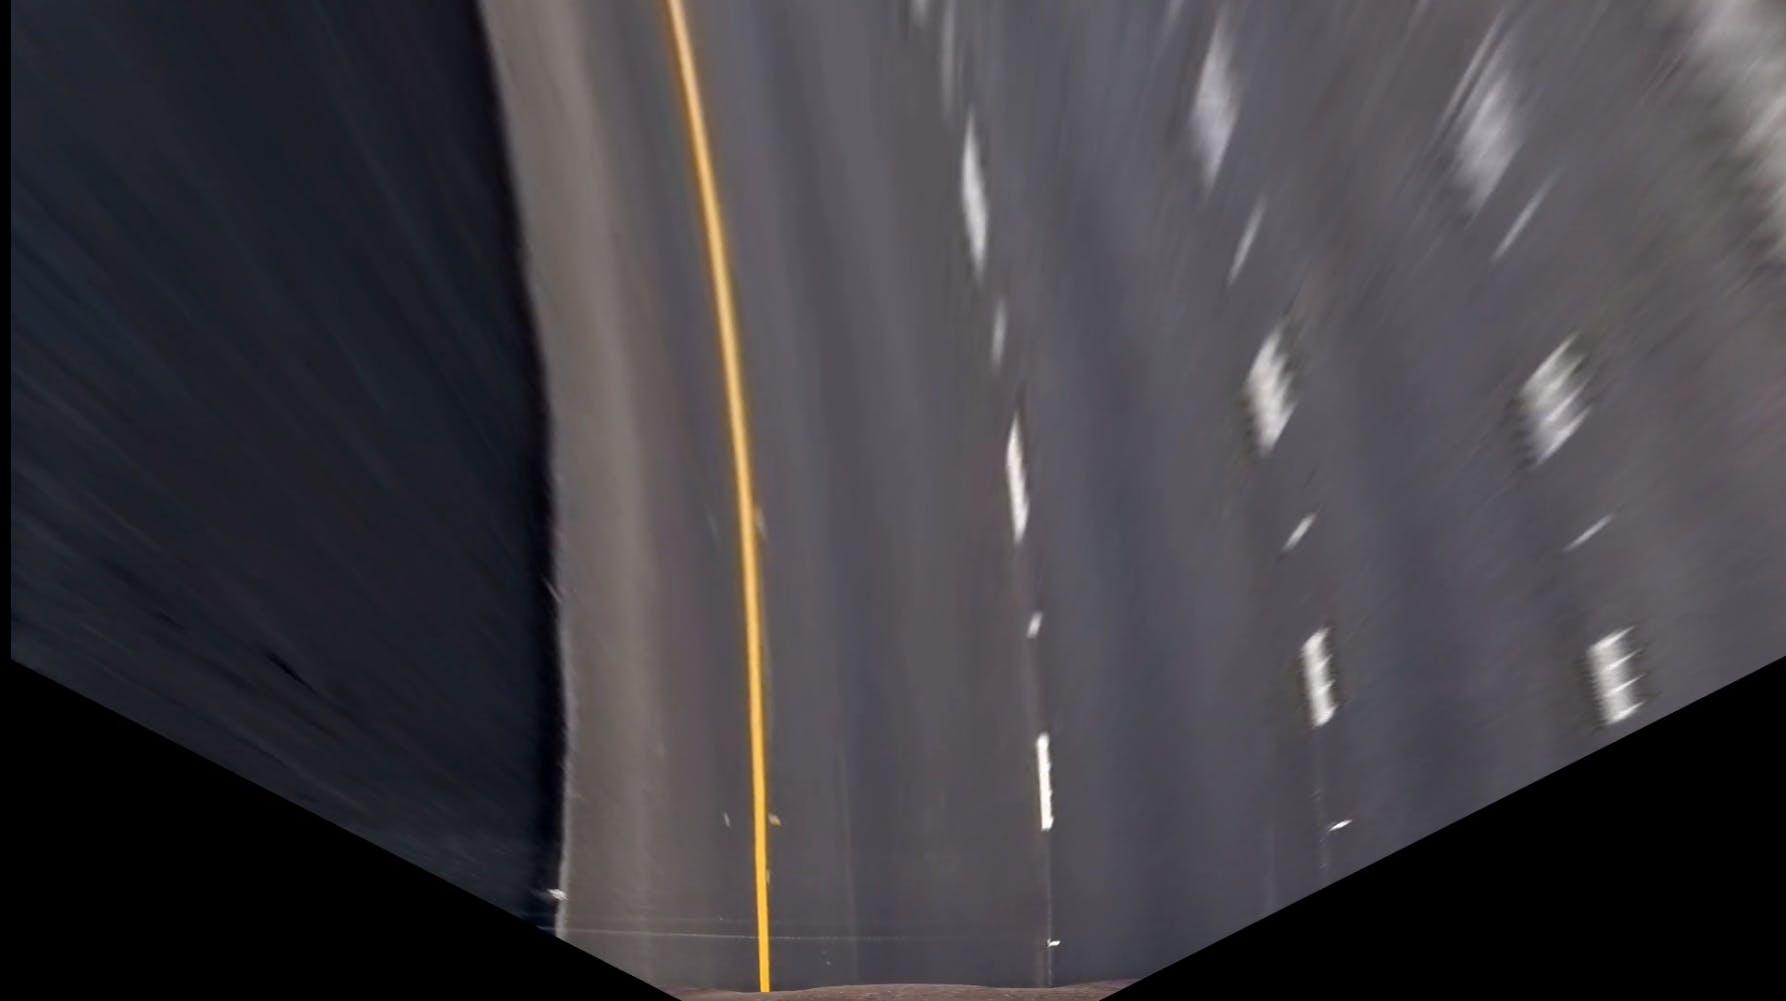 Perspective warped image